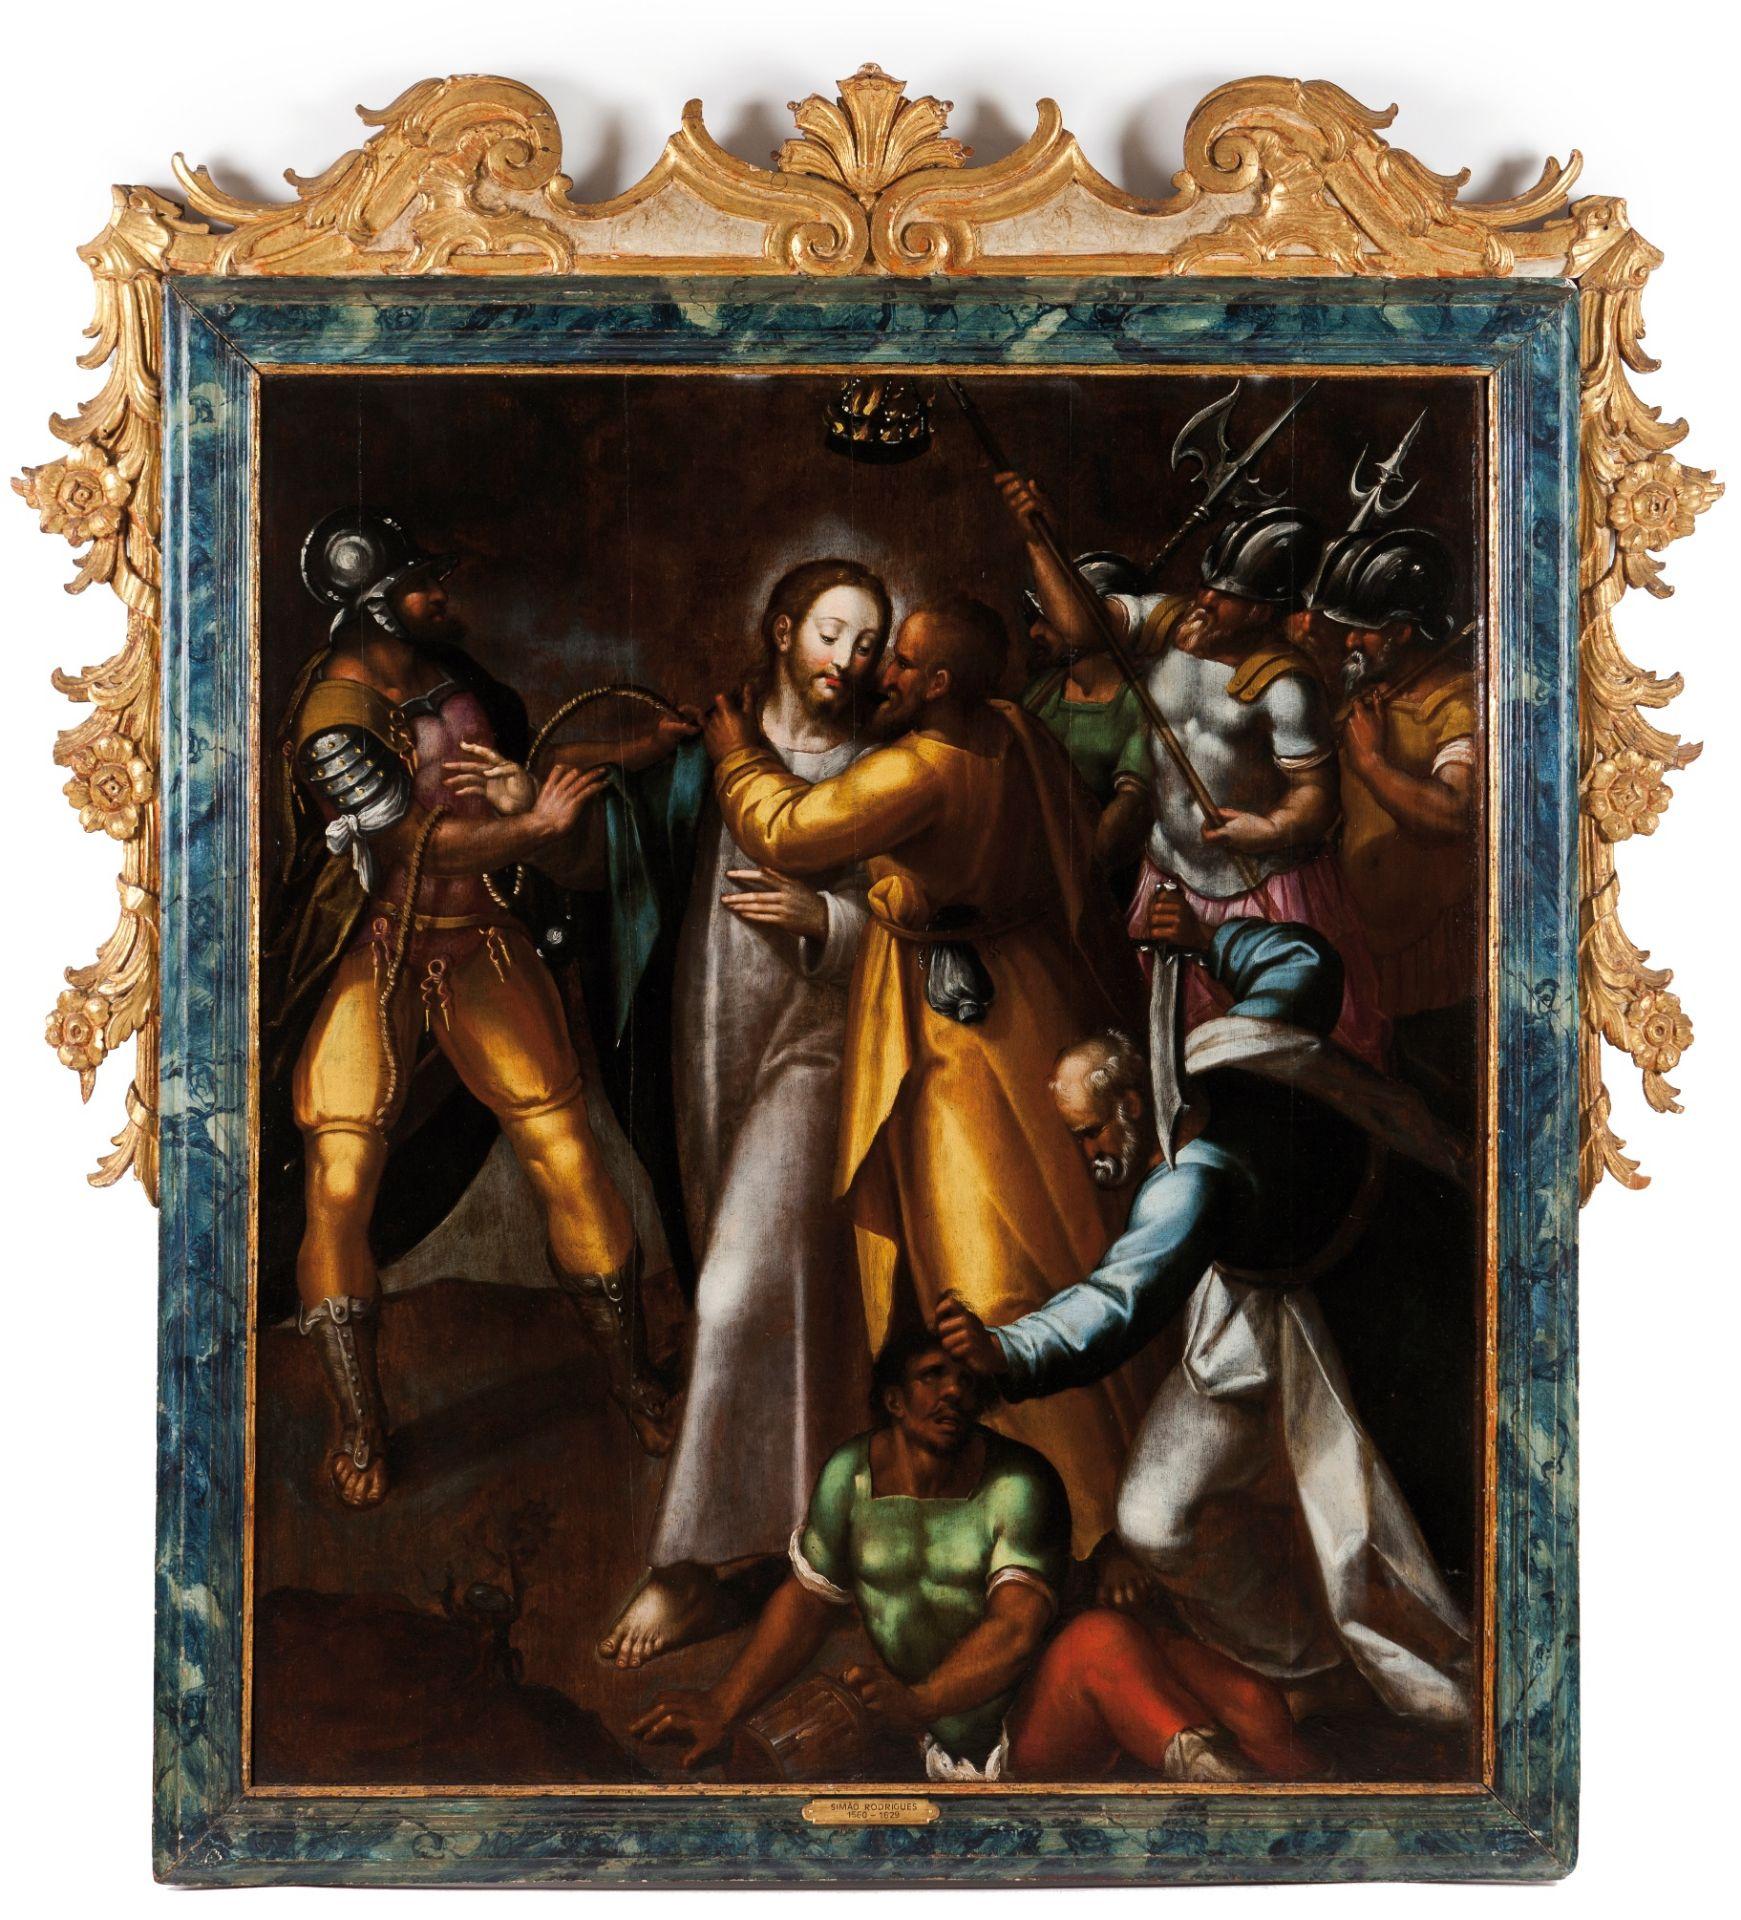 Simão Rodrigues (c. 1560-1629)The kiss of Judas - Image 2 of 2